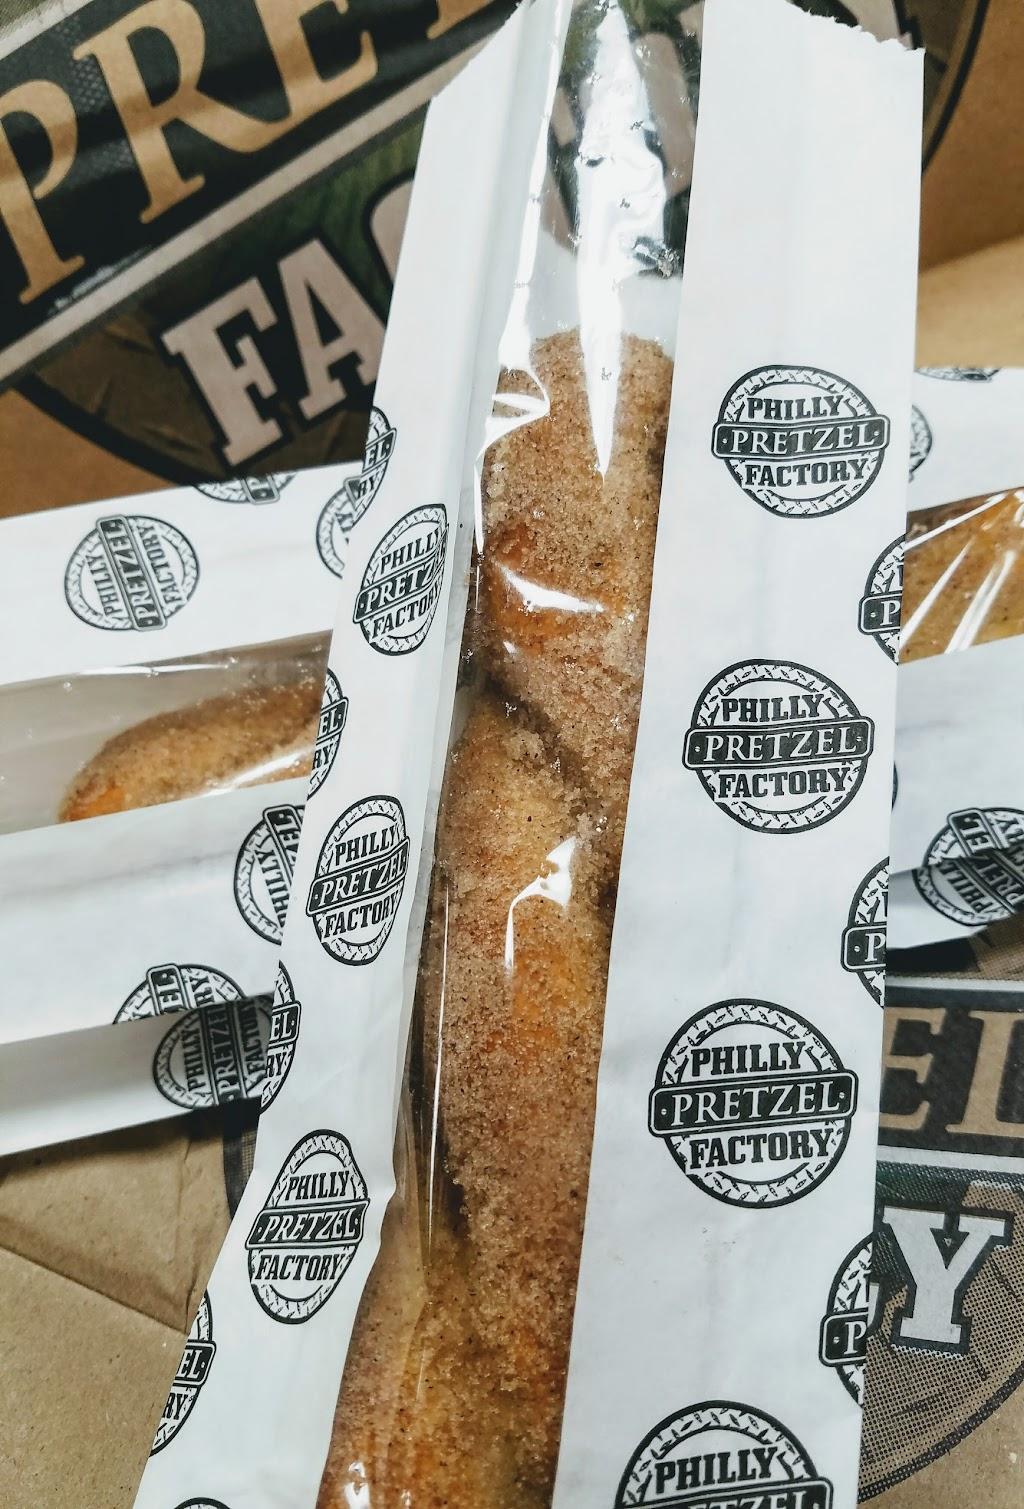 Philly Pretzel Factory   bakery   3575 NJ-66, Neptune City, NJ 07753, USA   7326439800 OR +1 732-643-9800